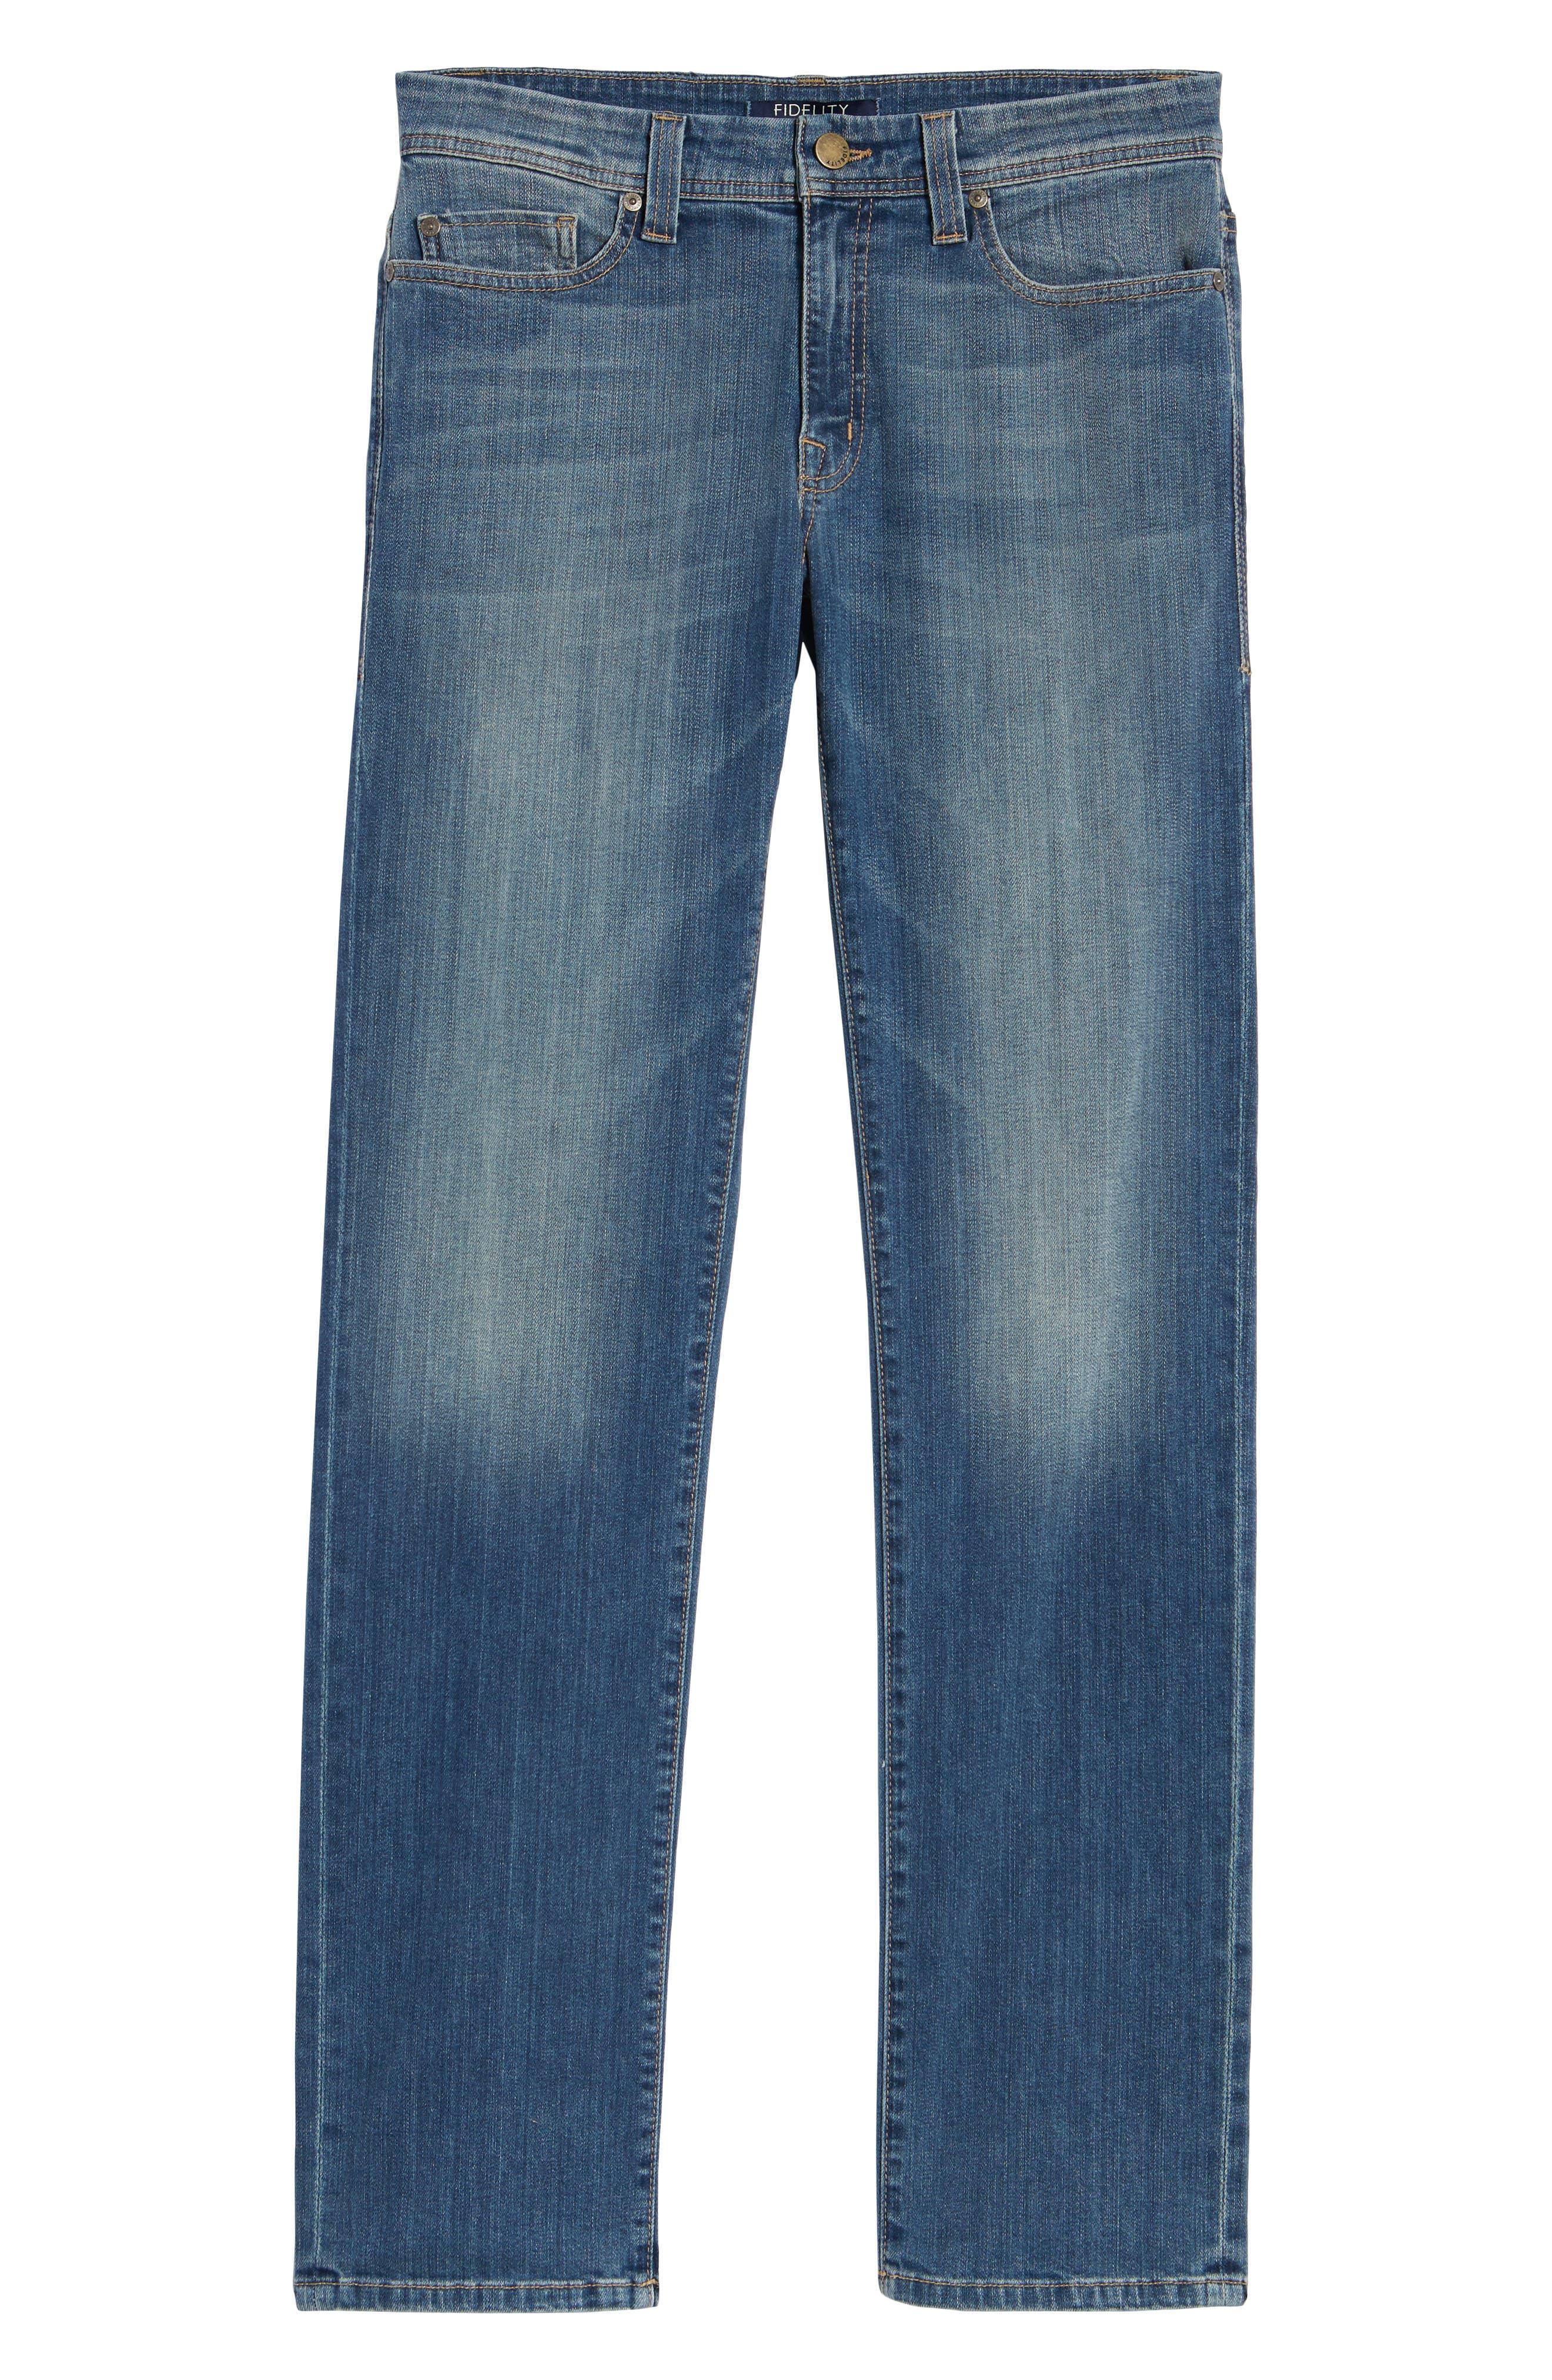 Jimmy Slim Straight Leg Jeans,                             Alternate thumbnail 6, color,                             SYNDICATE BLUE